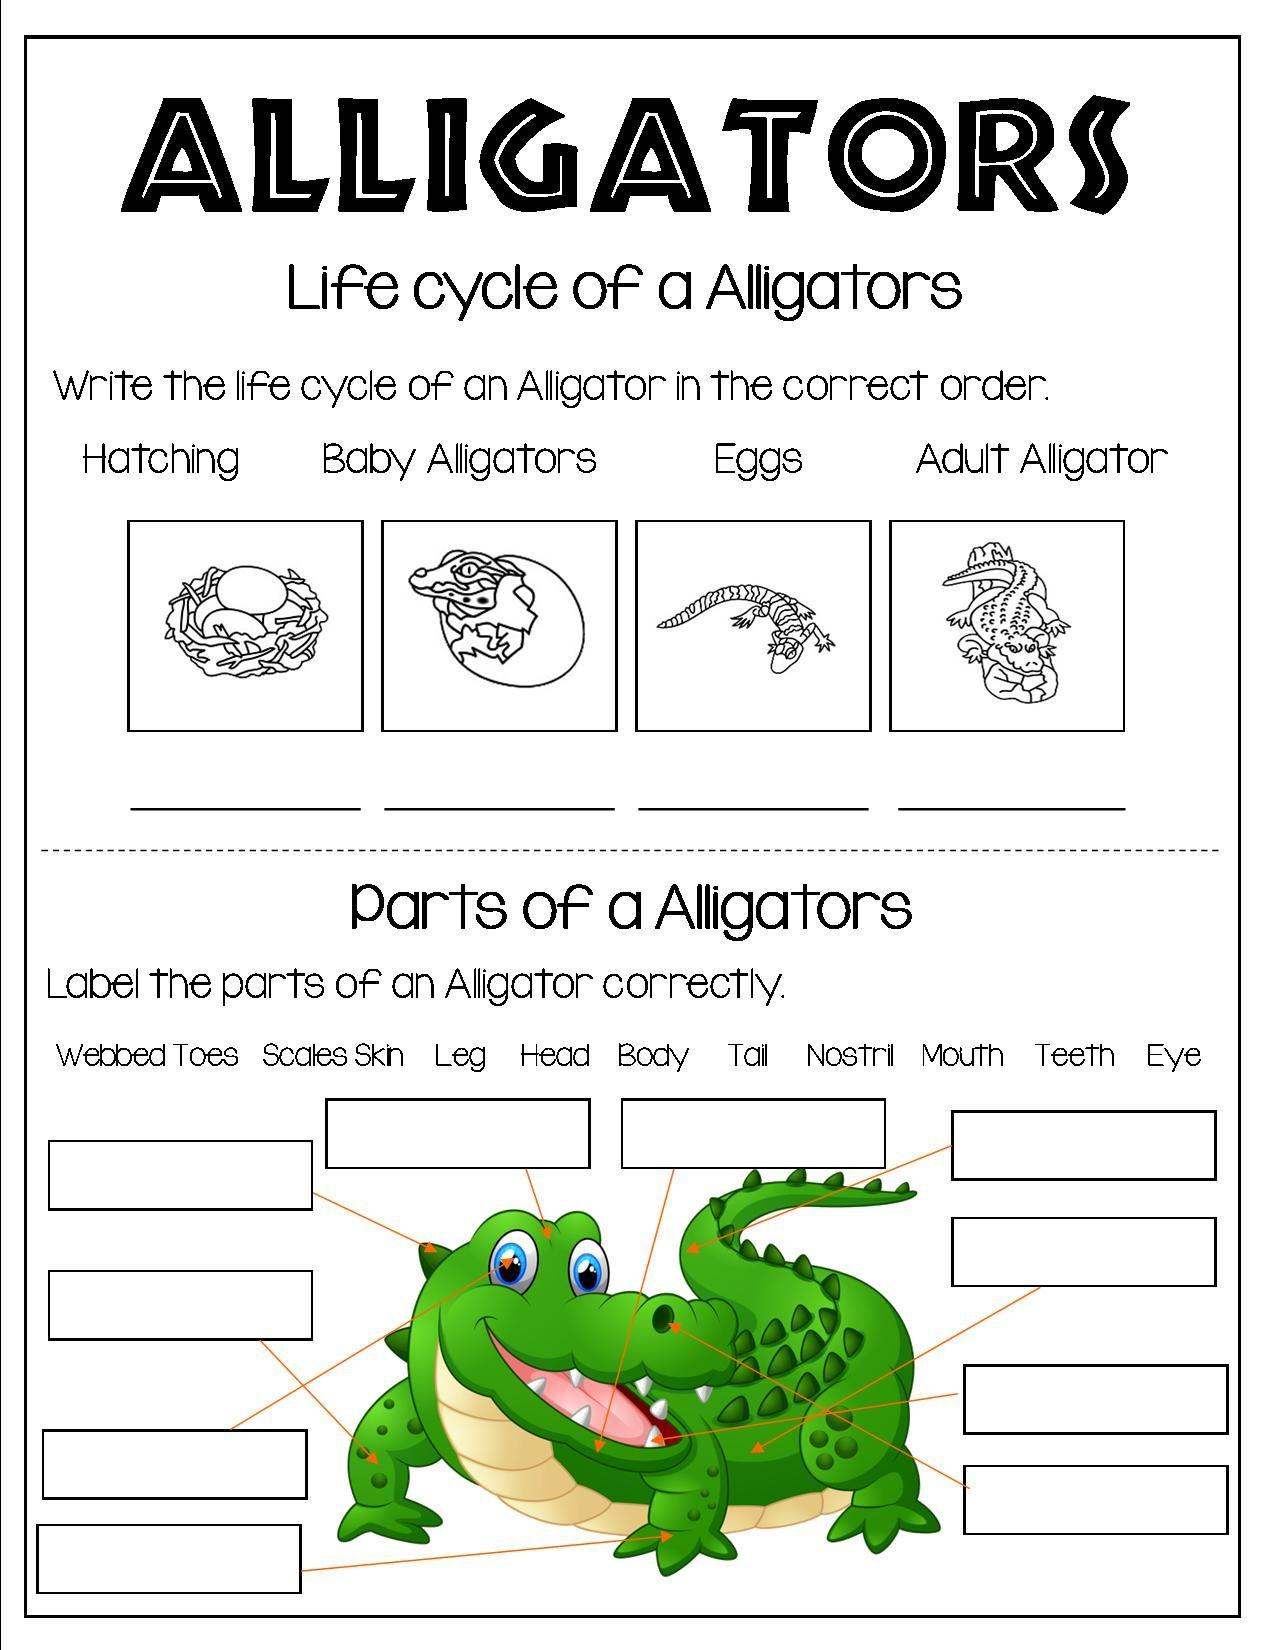 All About Alligators   Life cycles kindergarten [ 1650 x 1275 Pixel ]